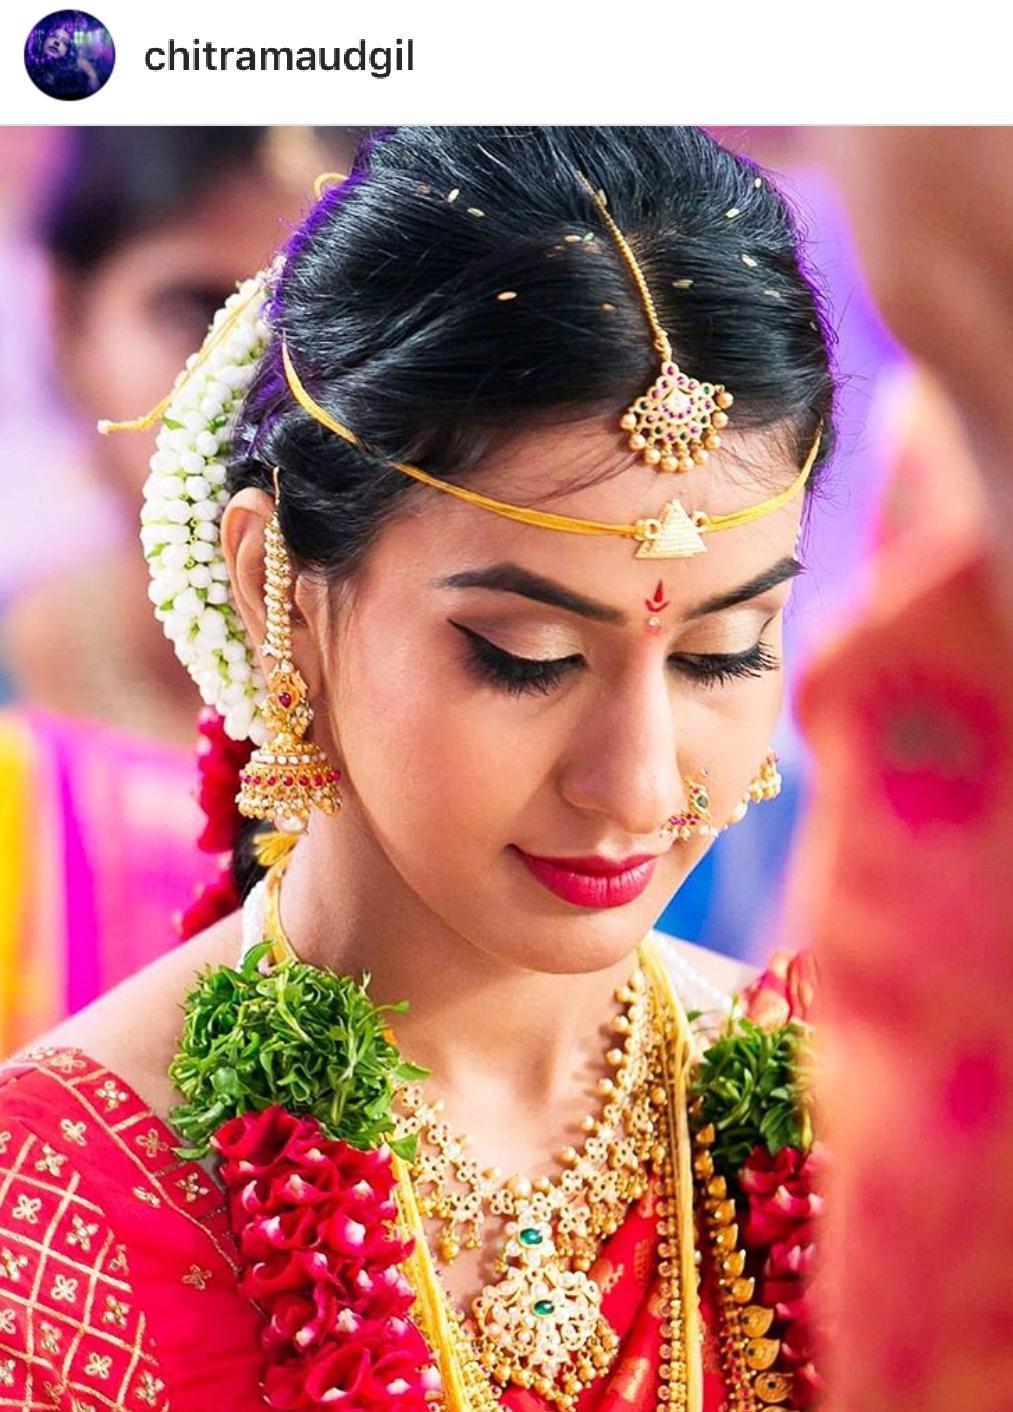 chitra-maudgil-makeup-artist-hyderabad